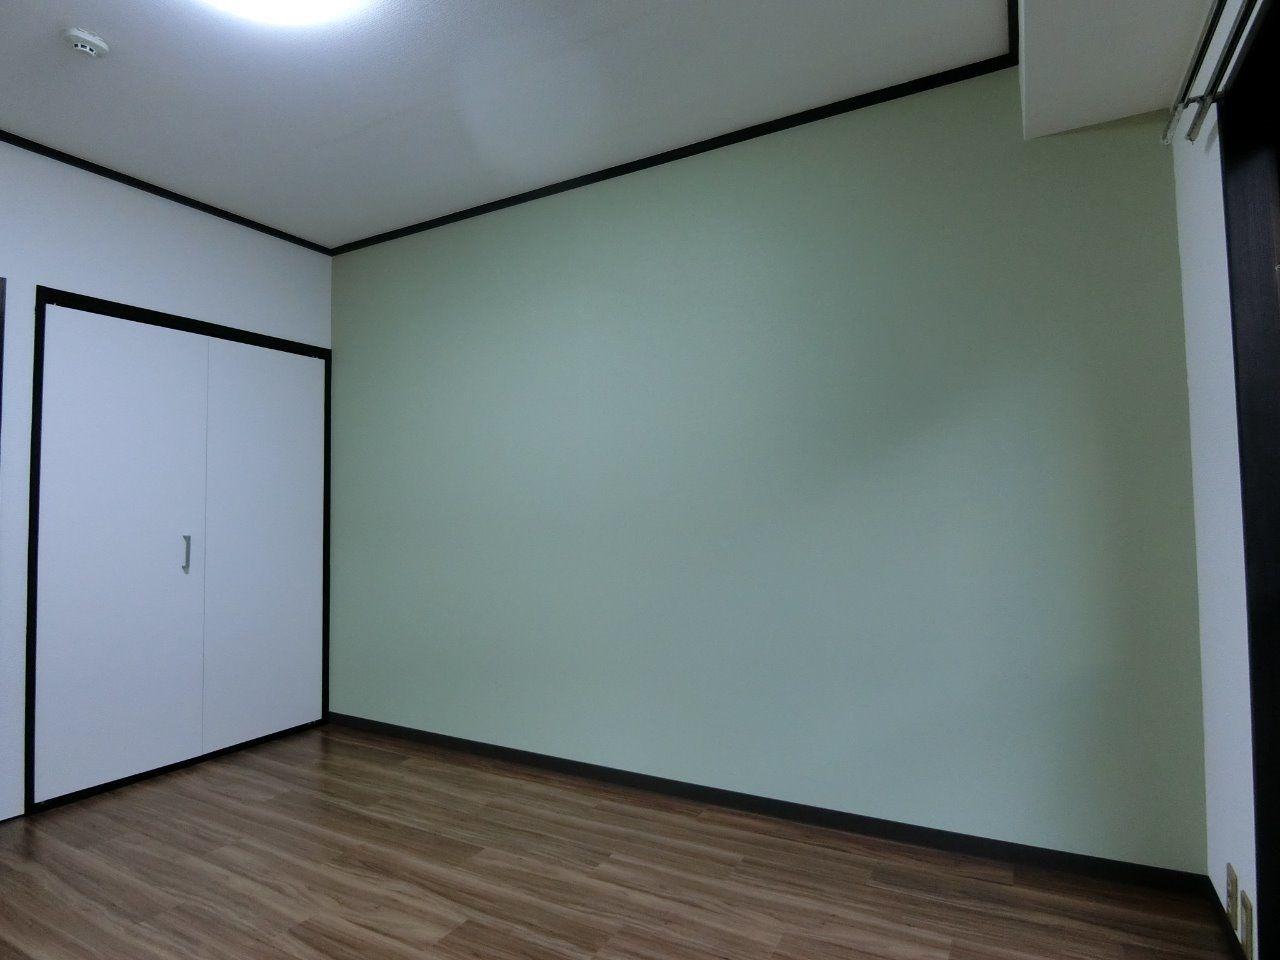 after 洋室(アクセントクロス)